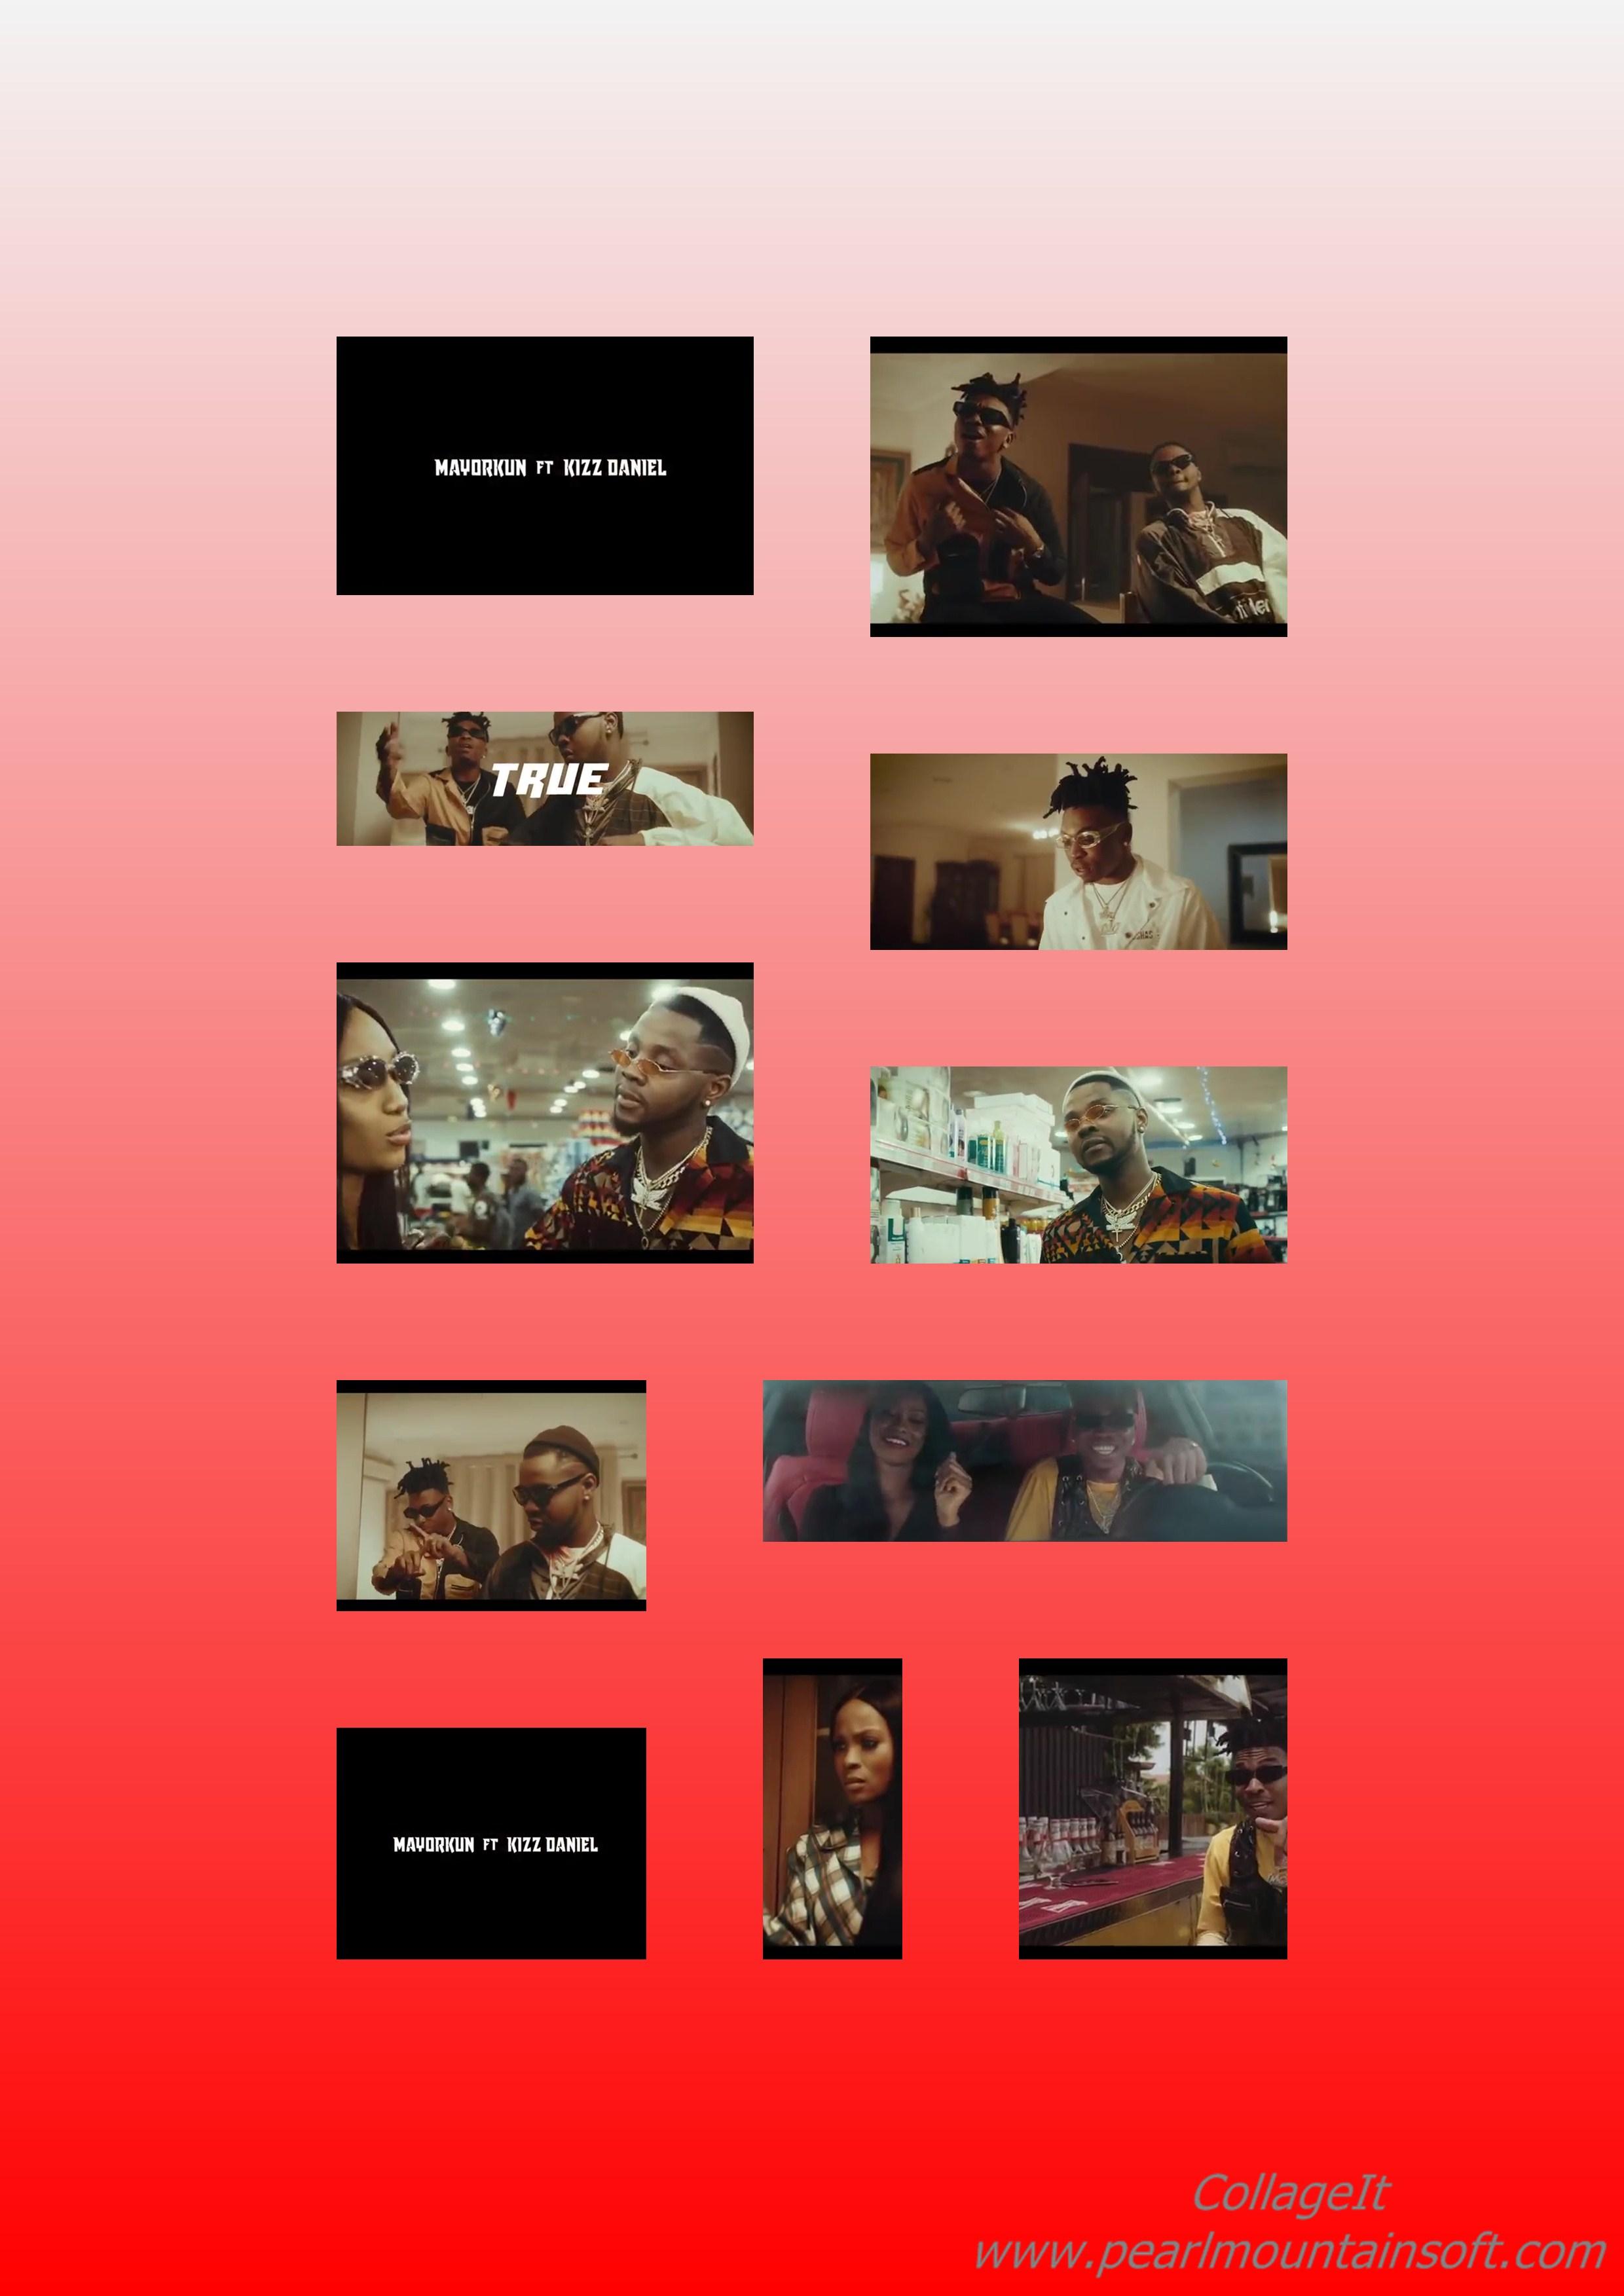 "(+LYRICS+TRANSLATION) MUSIC REVIEW: TRUE BY MAYORKUN FT KIZZ DANIEL ""BIKO, WHAT'S THAT MAYORKUN? HUUUM ON YOUR FACE?"""